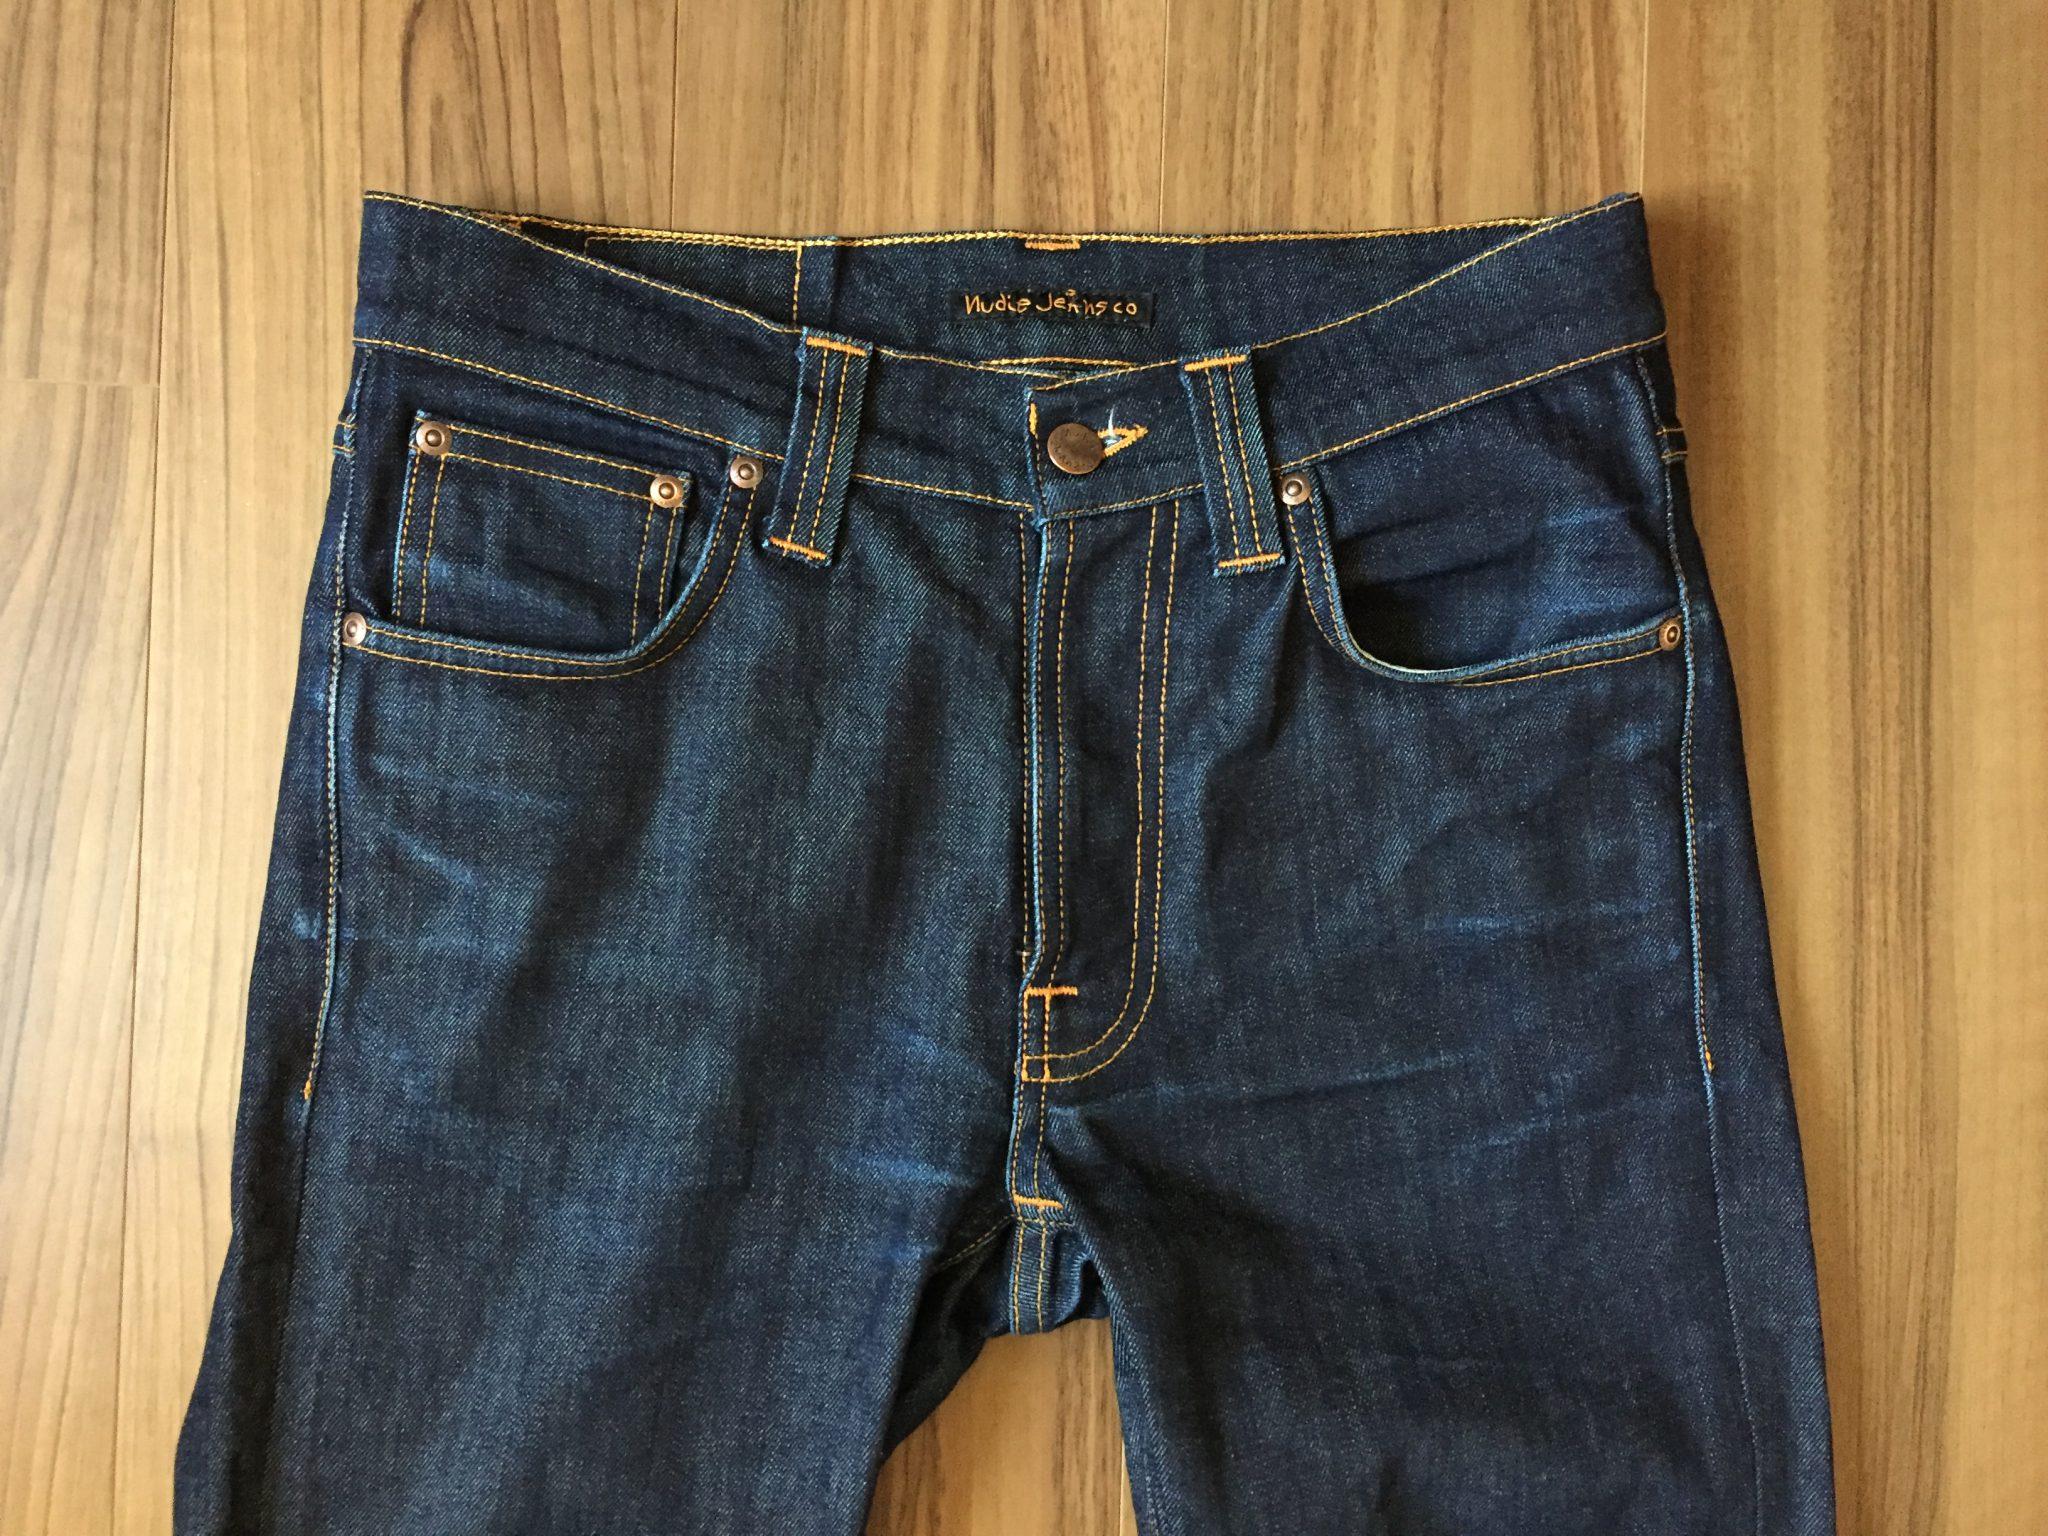 NudieJeans LeanDean Dry16Dips ファーストウォッシュ|糊を落とさず穿いてきたヌーディのリーンディーンを113日1300時間で初めて洗濯しました